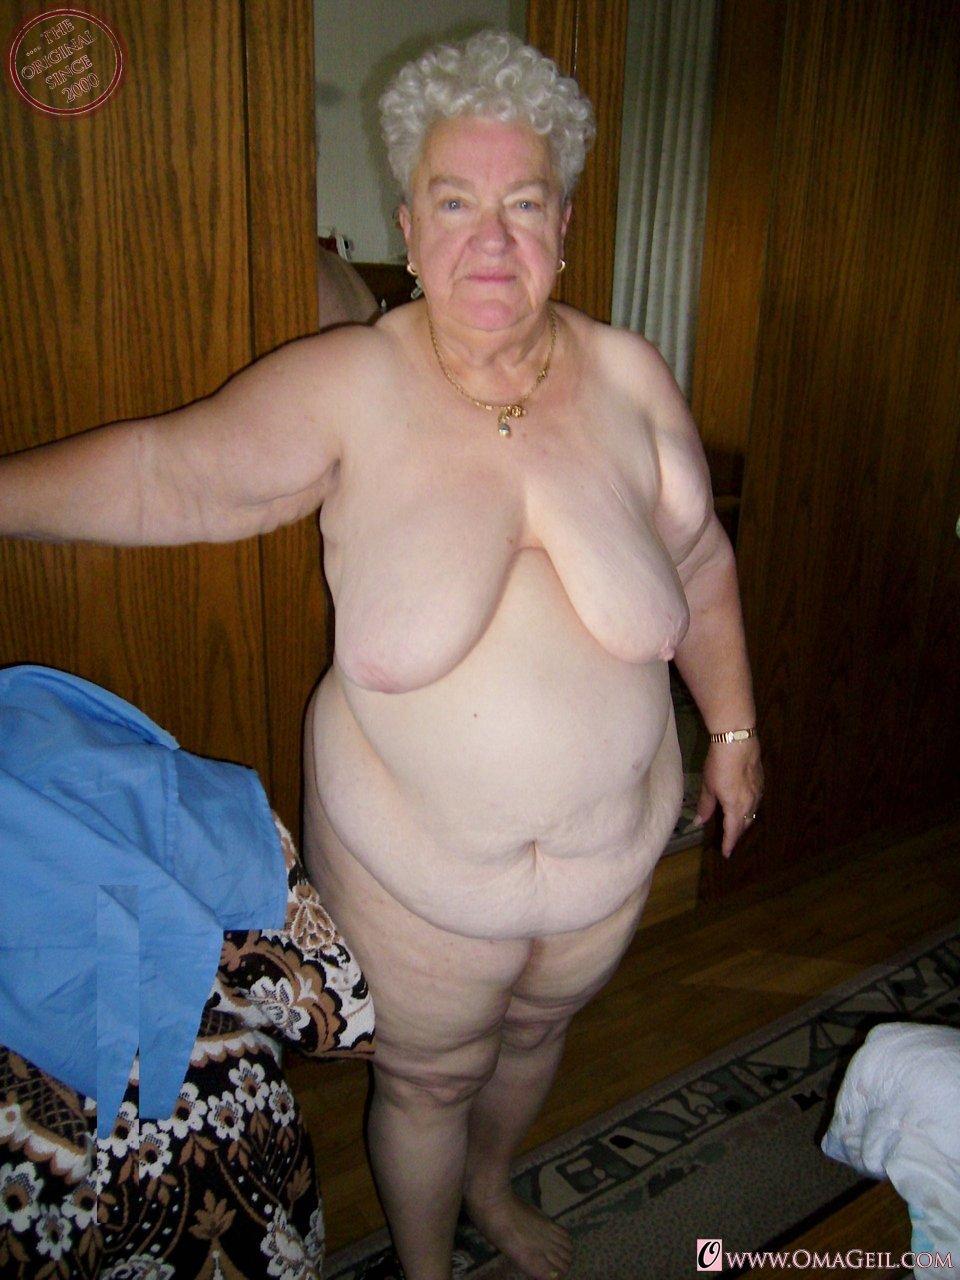 Primary girls nude photo